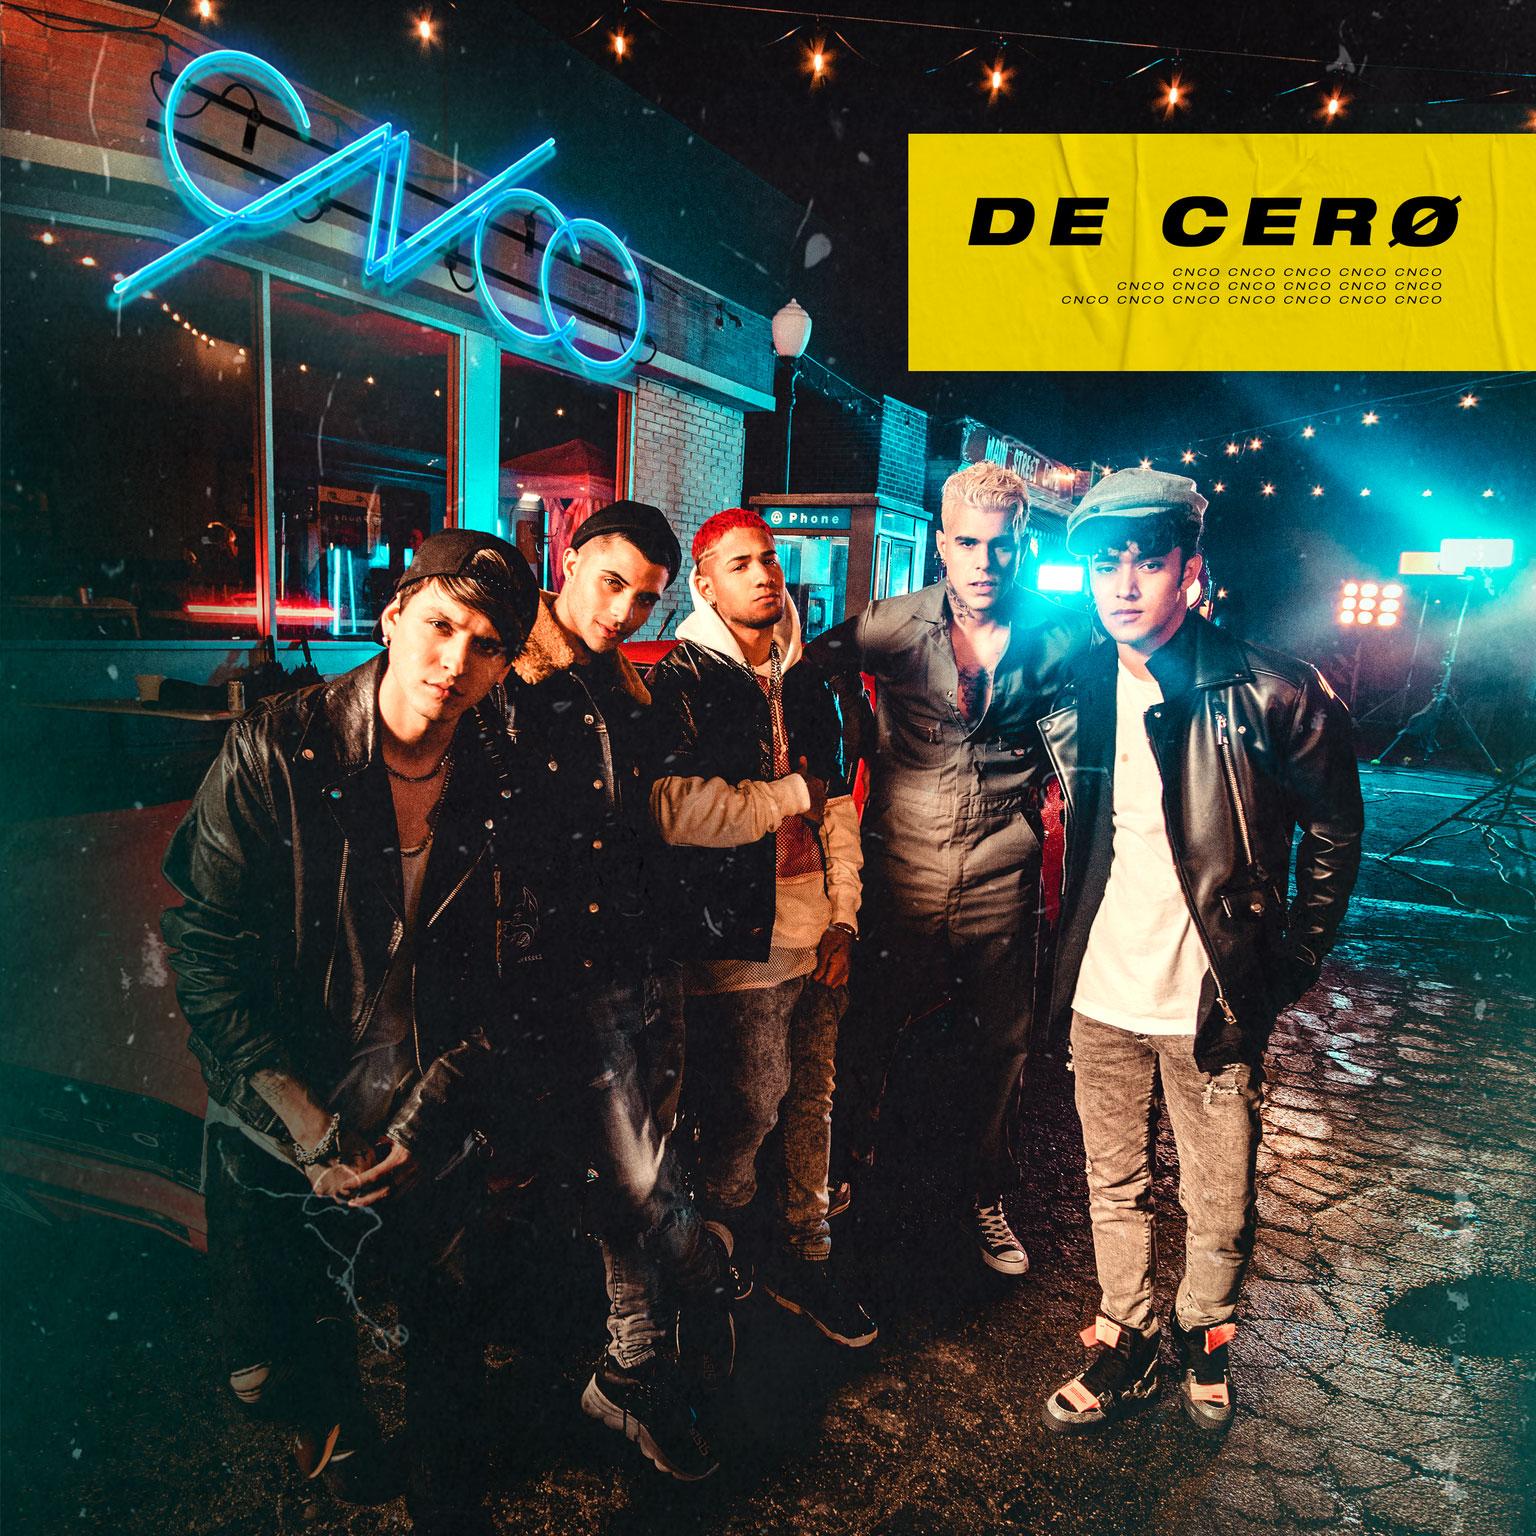 CNCO_DeCero_Cover